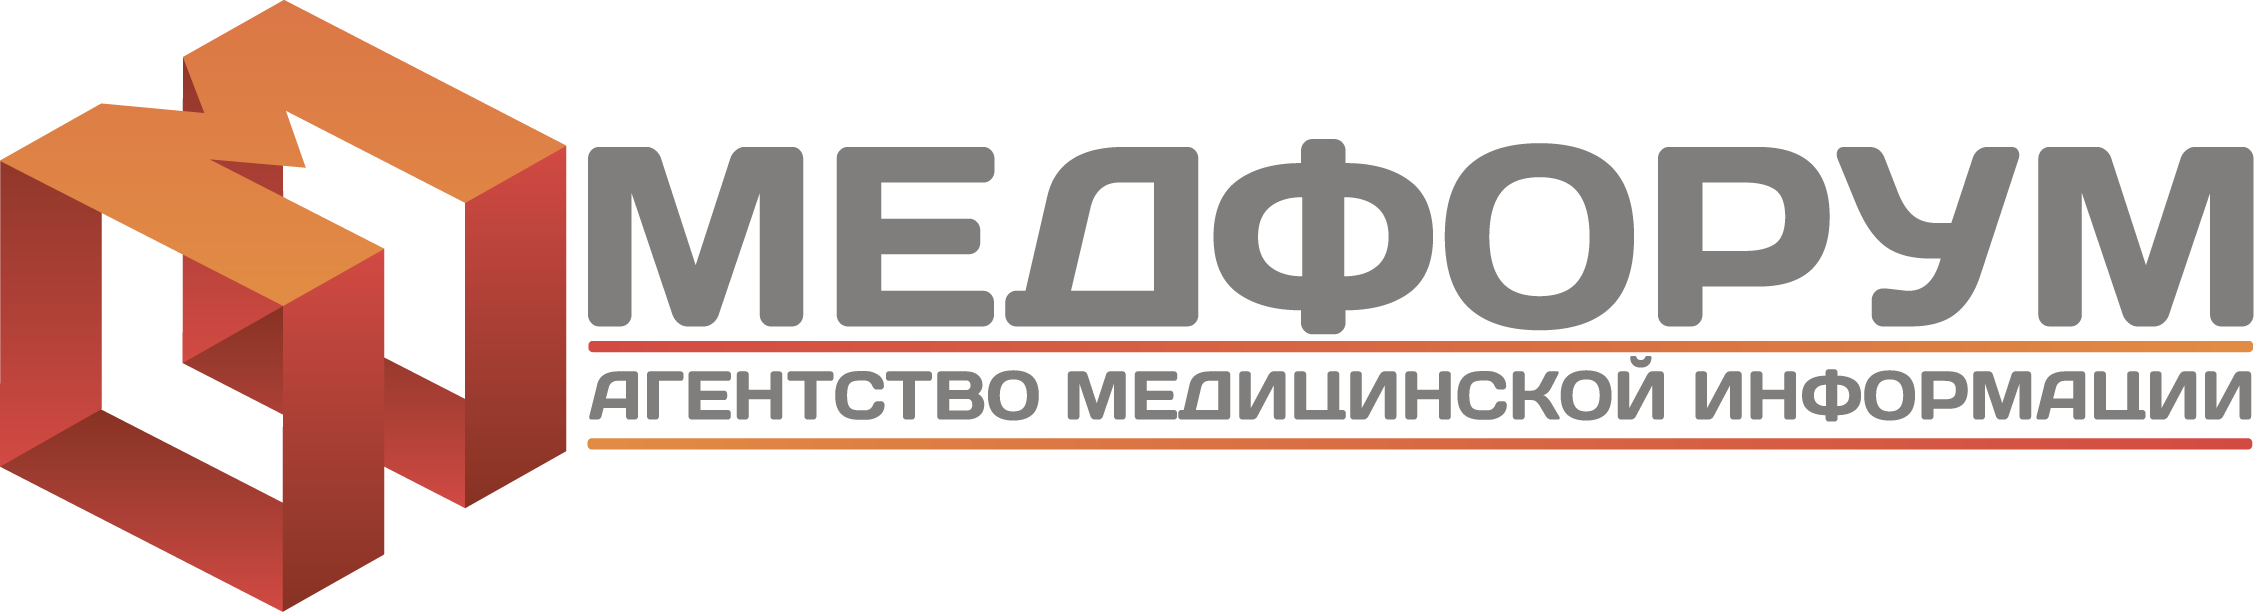 logo_medforum_19.12